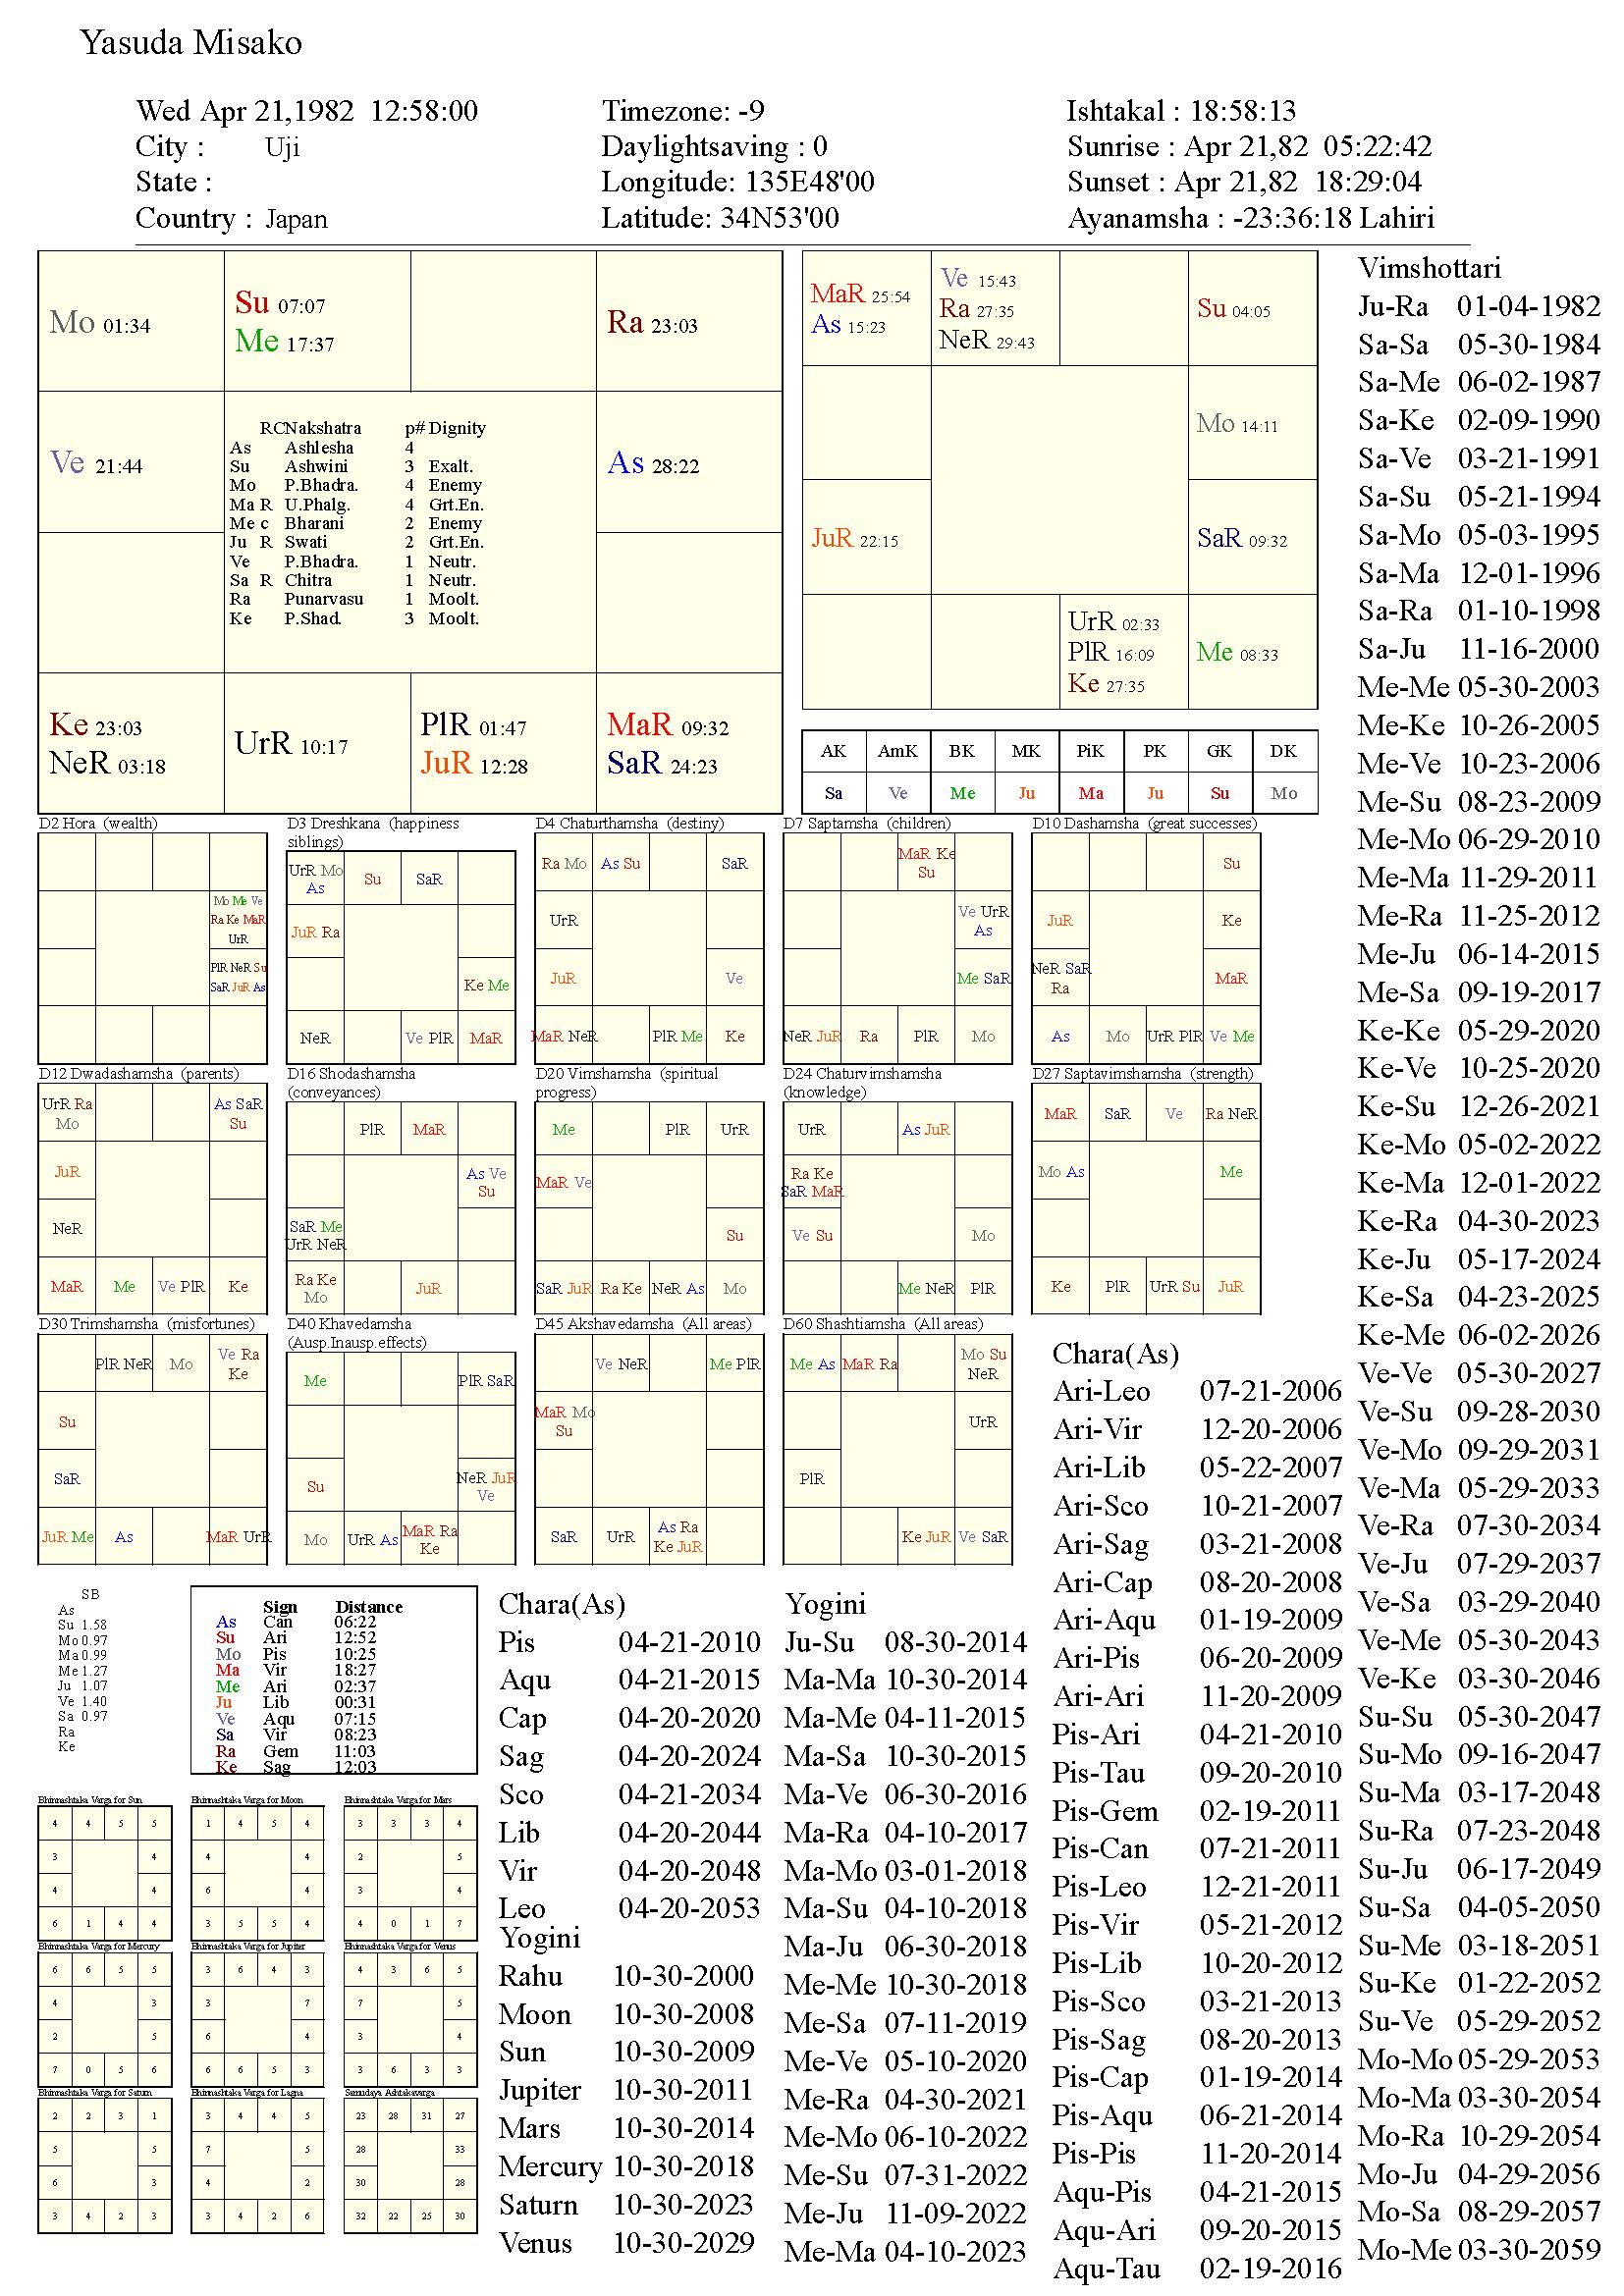 yasudamisako_chart